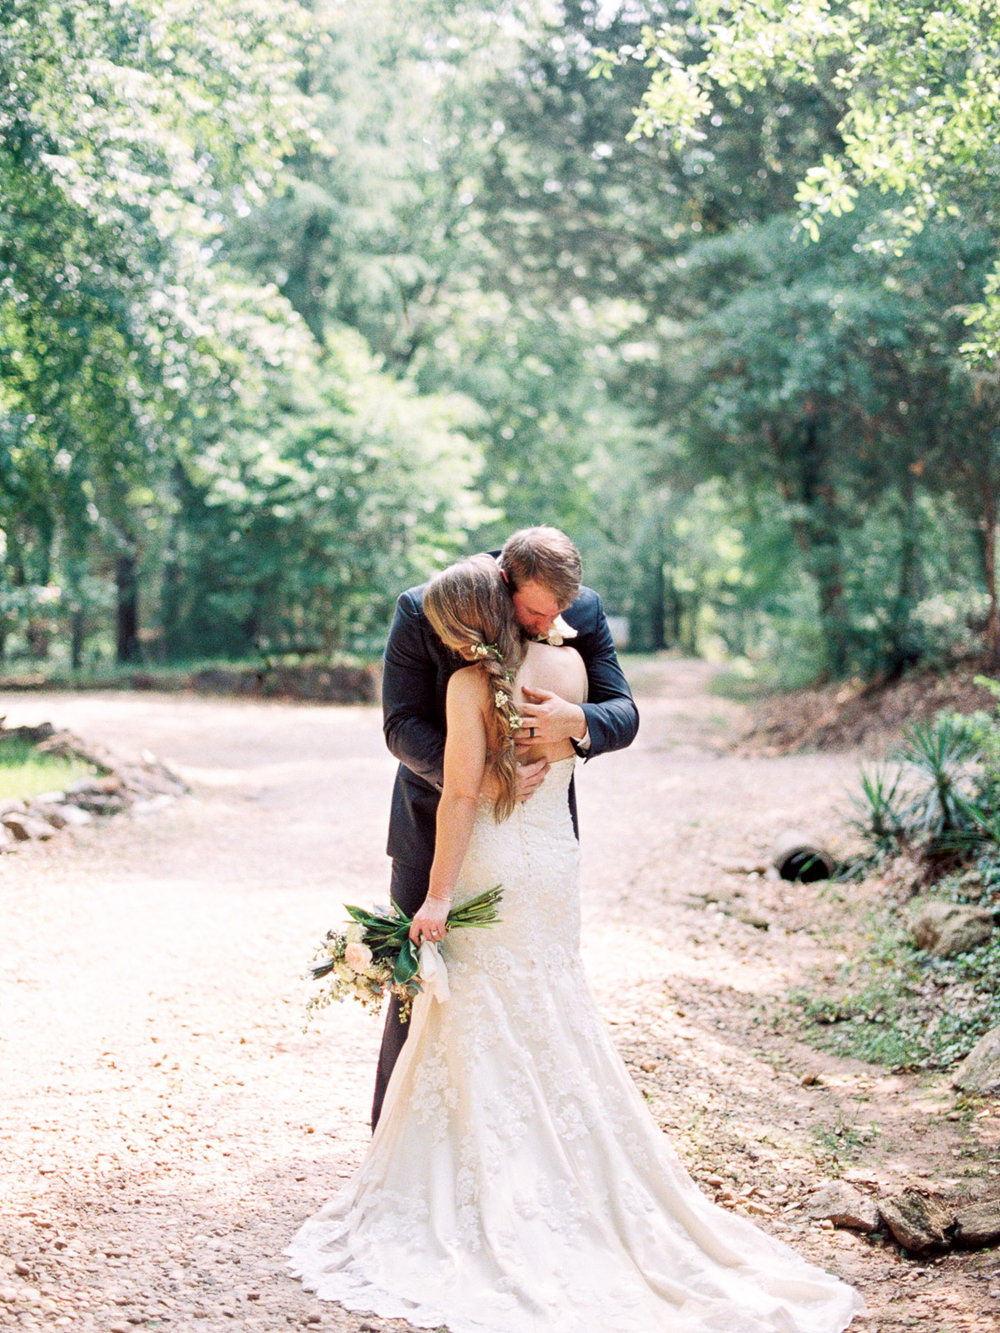 christinadavisphotography-romanticwedding-gardenweddinginspiration32.jpg